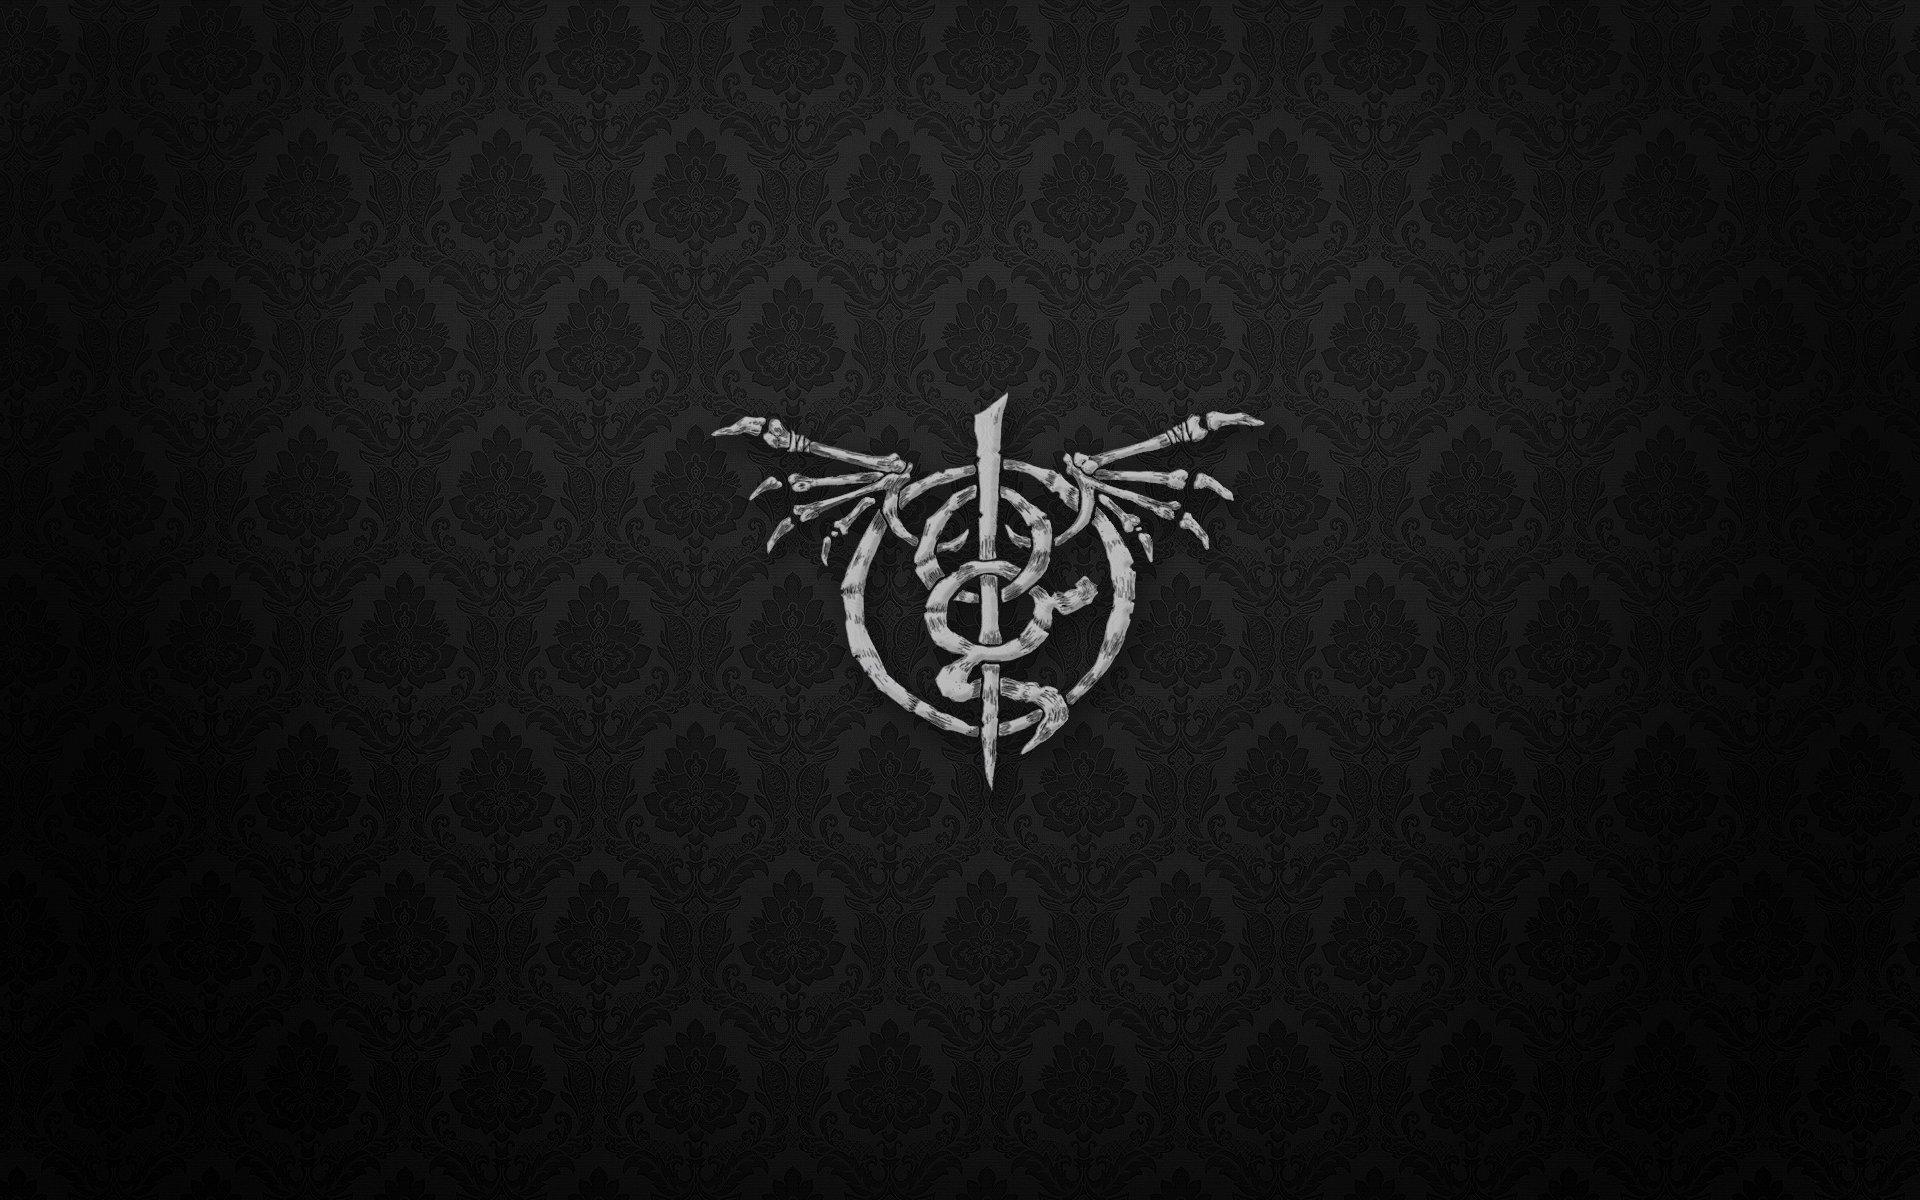 Lamb Of God Iphone Wallpaper Lamb Of God Groove Metal Heavy Dark G Wallpaper